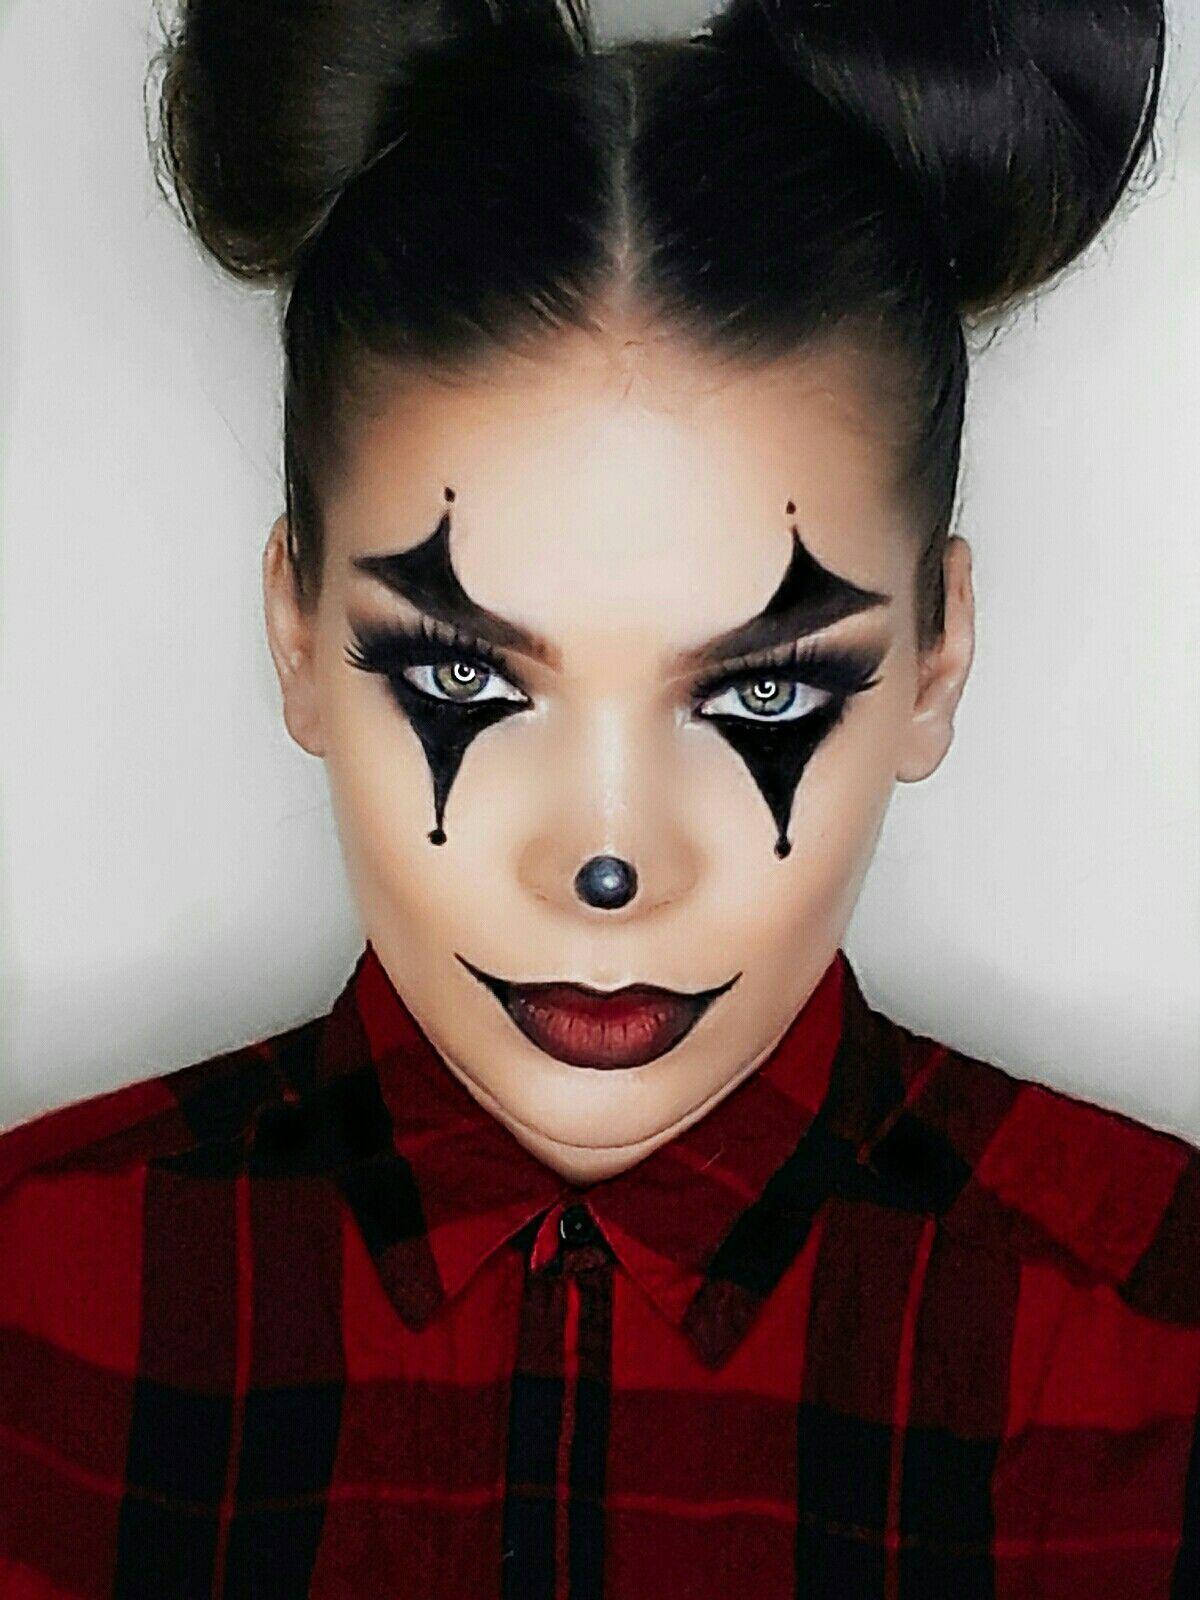 Clown makeup Halloween makeup #Costumemakeup | moodboard ...